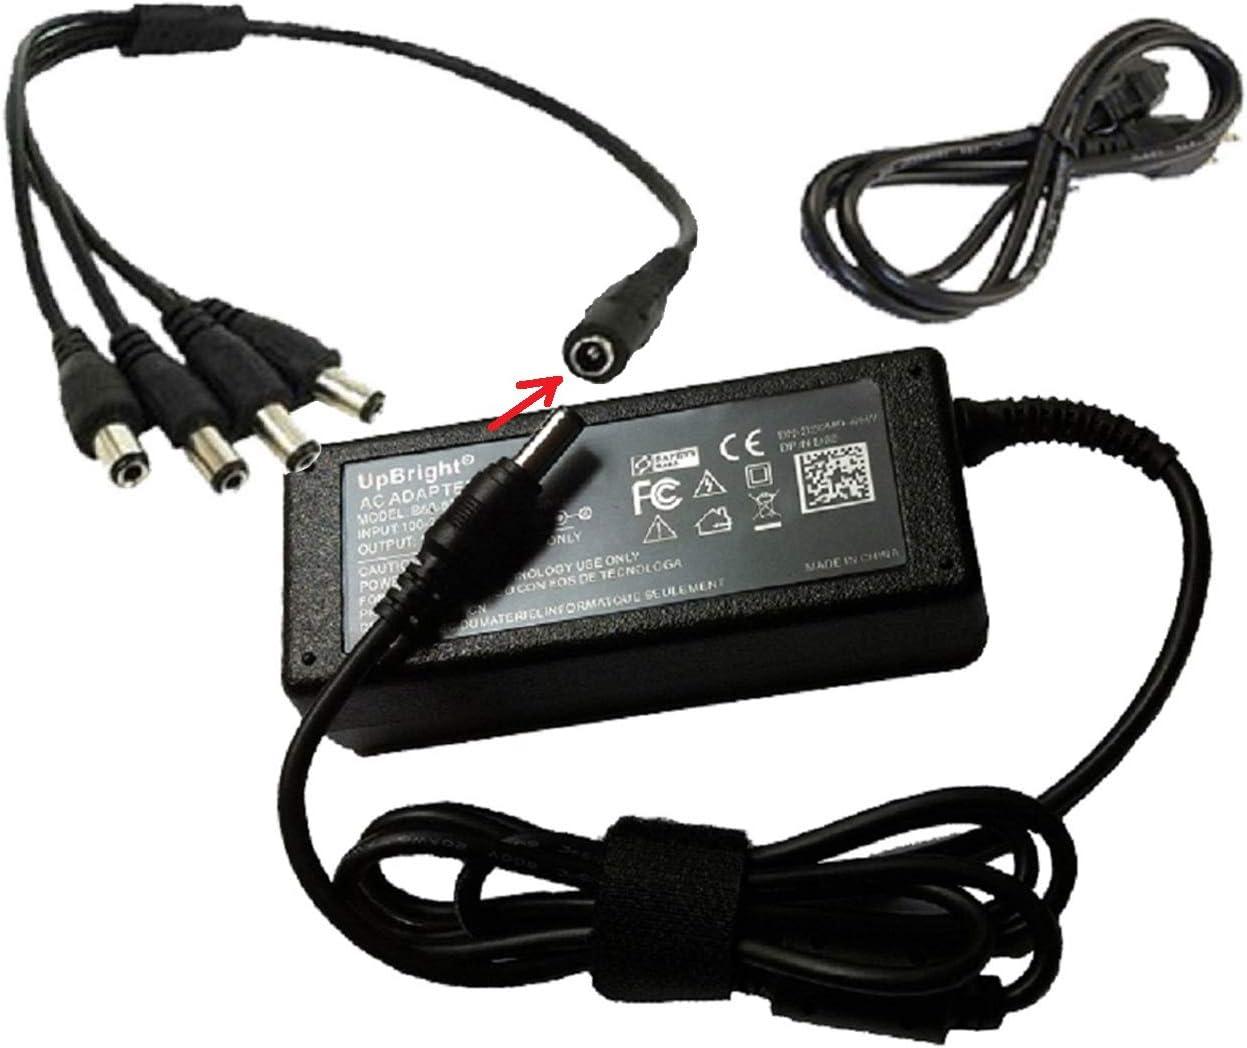 12V 5A 60W AC//DC Adapter for Swann CCTV Camera DVR Pro-530 SWPRO-530CAM PRO-535 SWPRO-535CAM-US PRO-555 SW331-PR5 PRO-580 SWPRO-580CAM PRO-581 PRO-842 Power PSU UpBright 4 Splitter//4 Way Power Cord